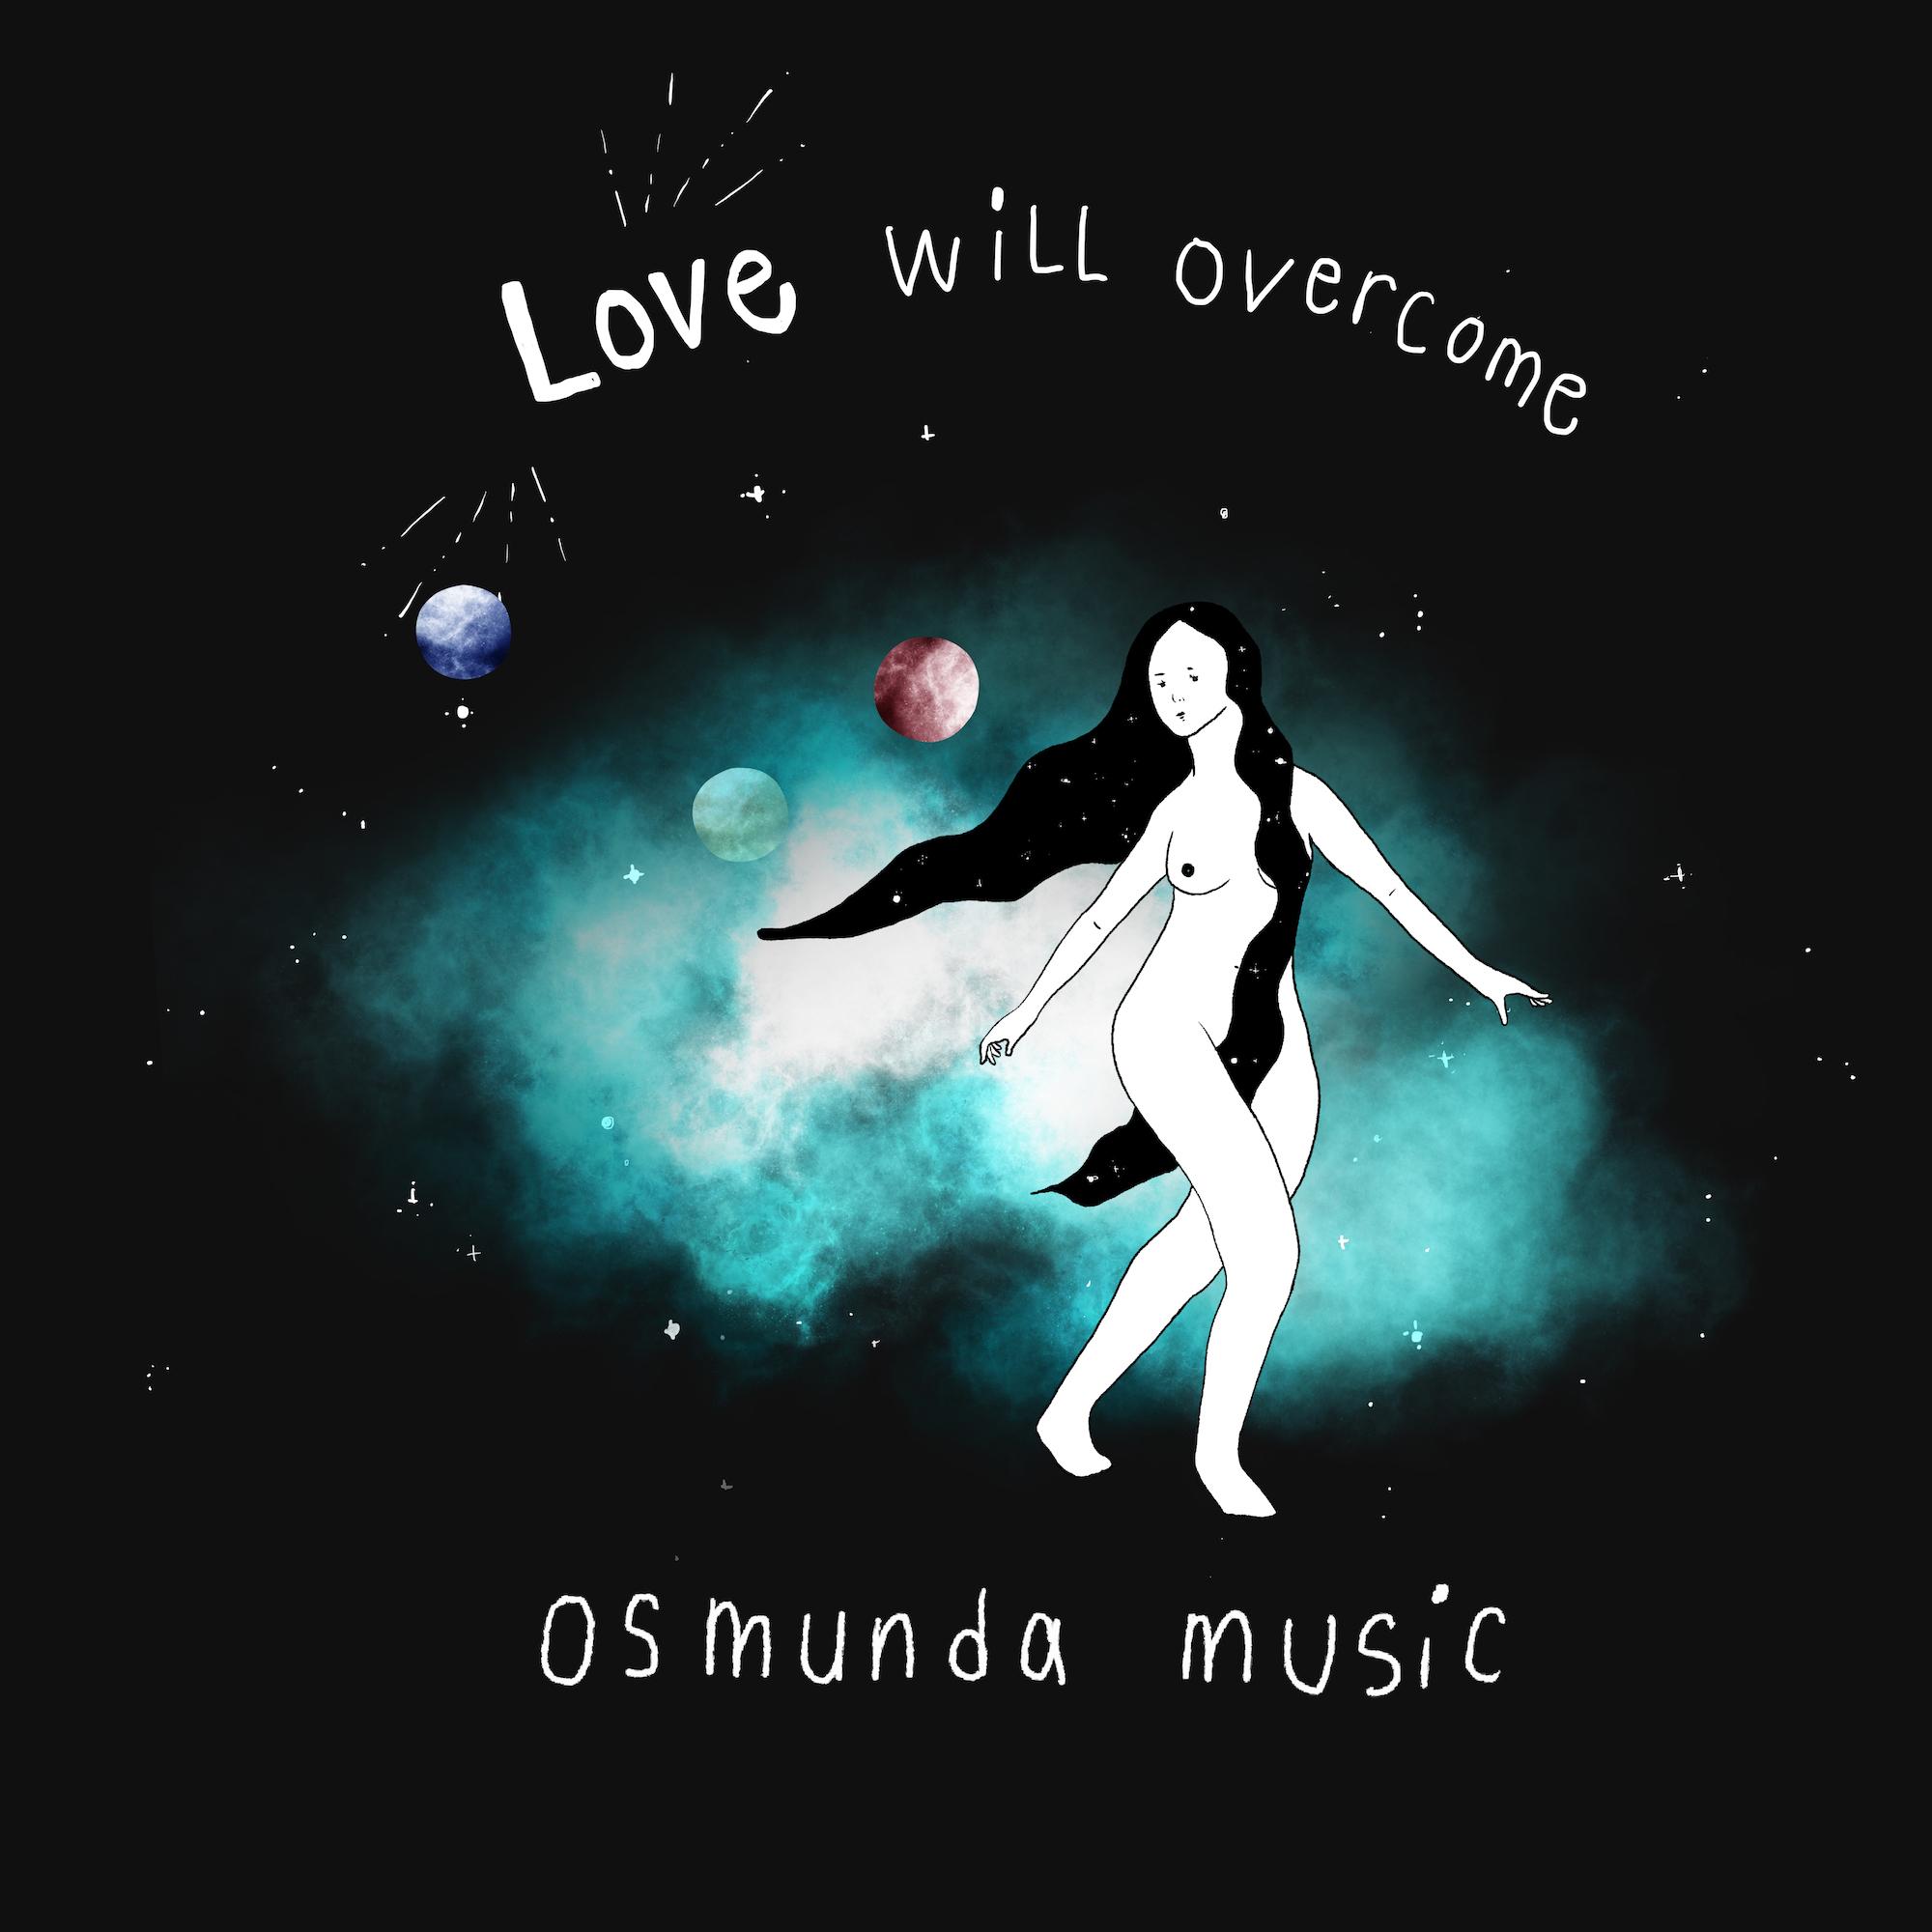 Love Will Overcome by Osmunda Music